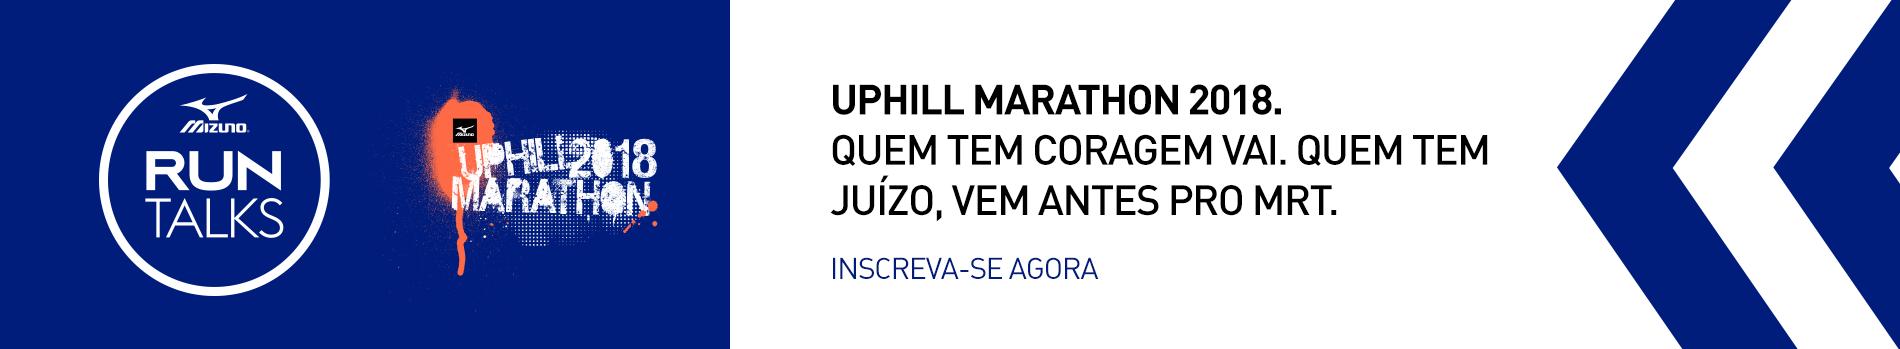 Mizuno Run Talks - Mizuno Uphill Marathon - Imagem de topo